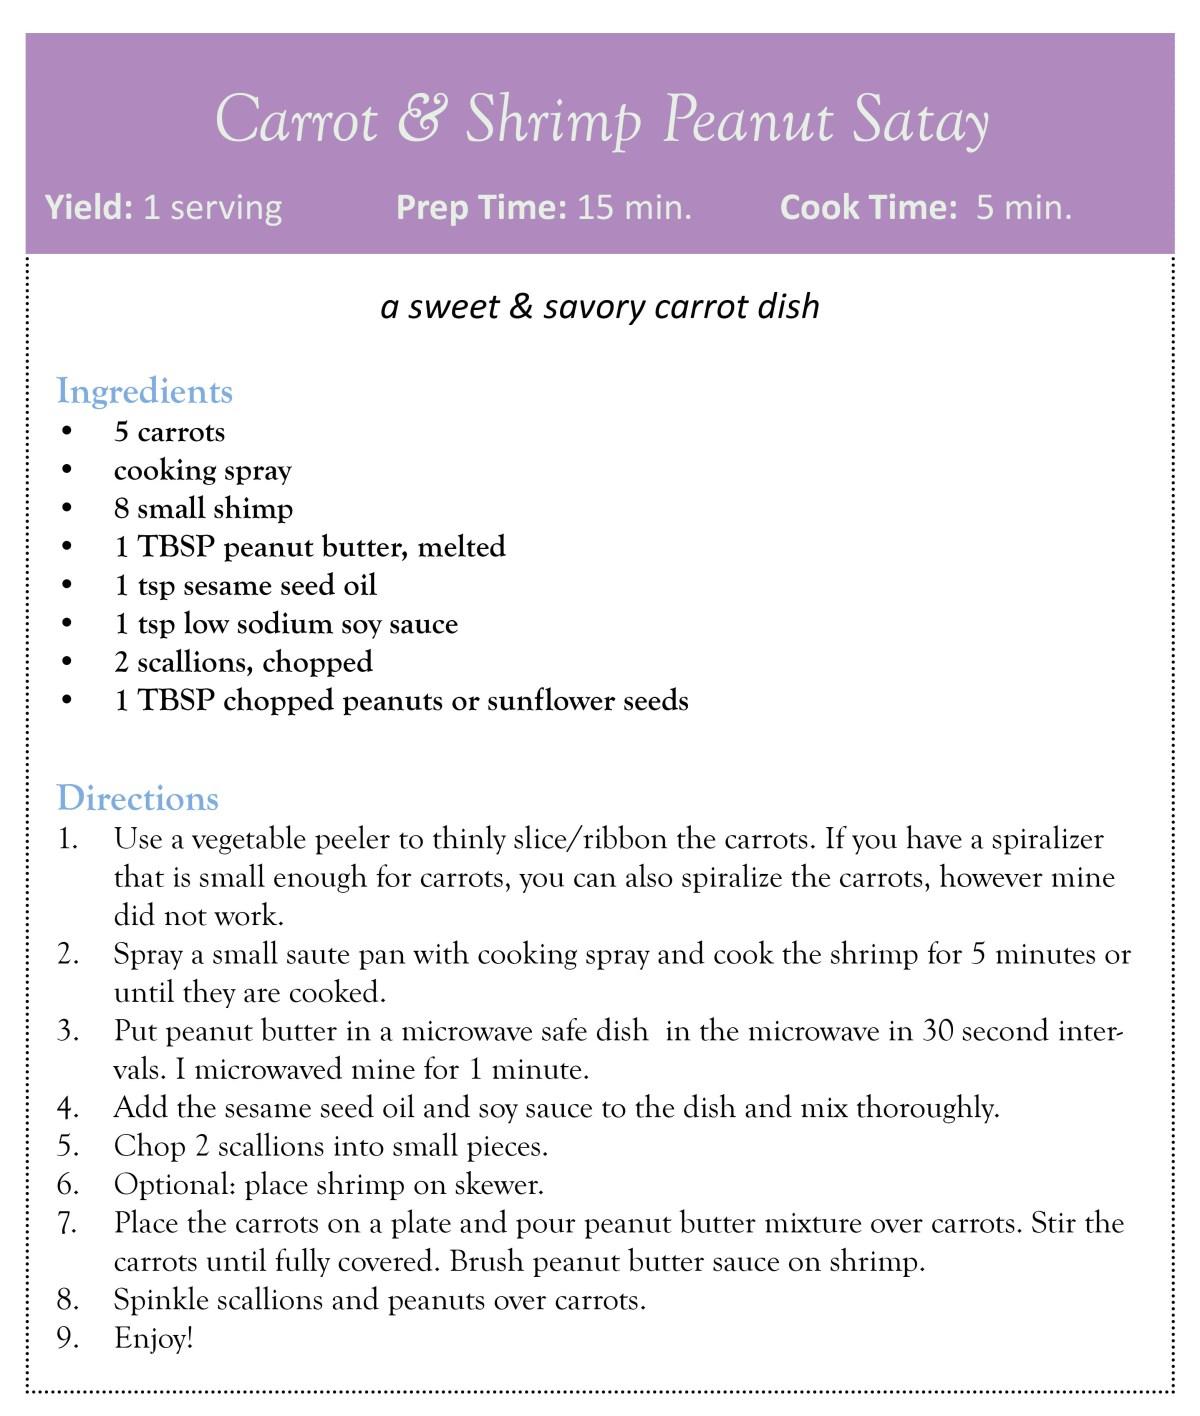 carrot & shrimp peanut satay